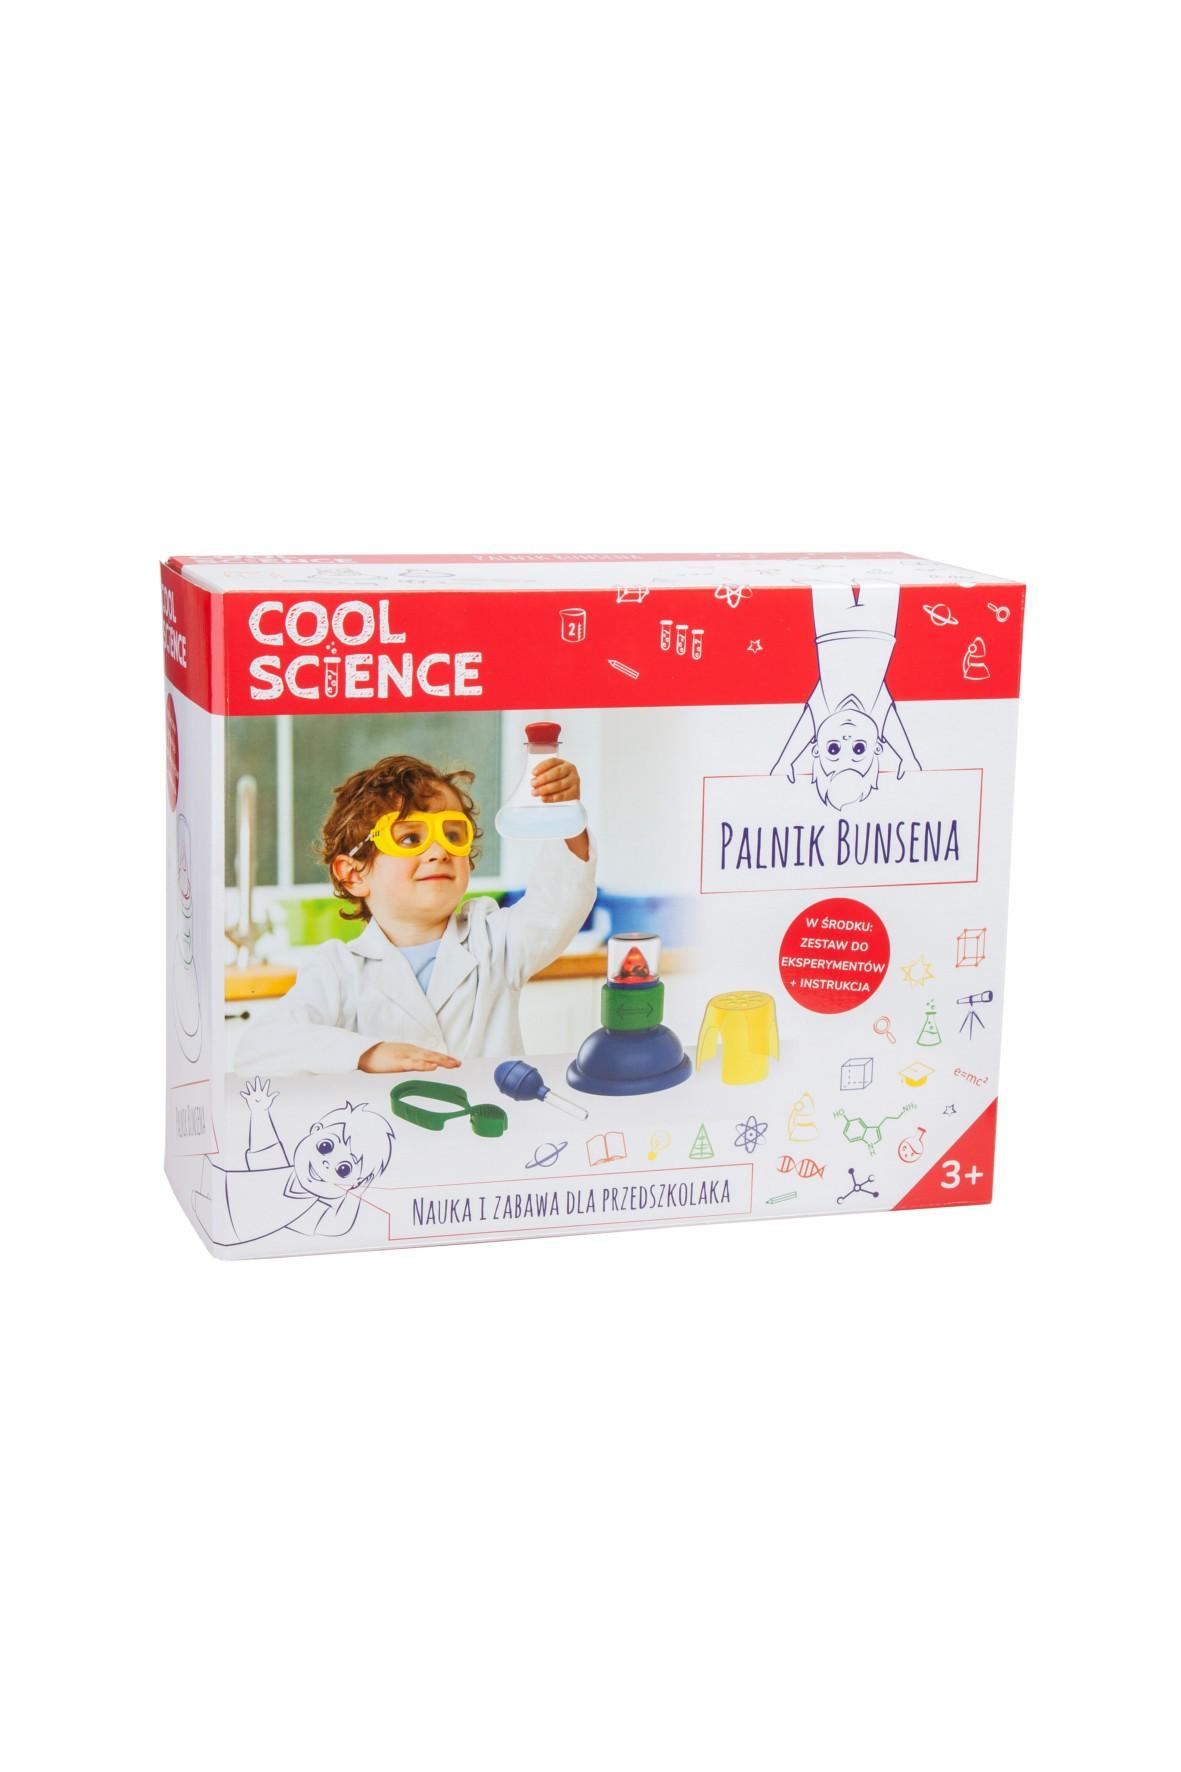 Cool Science- Palnik Bunsena